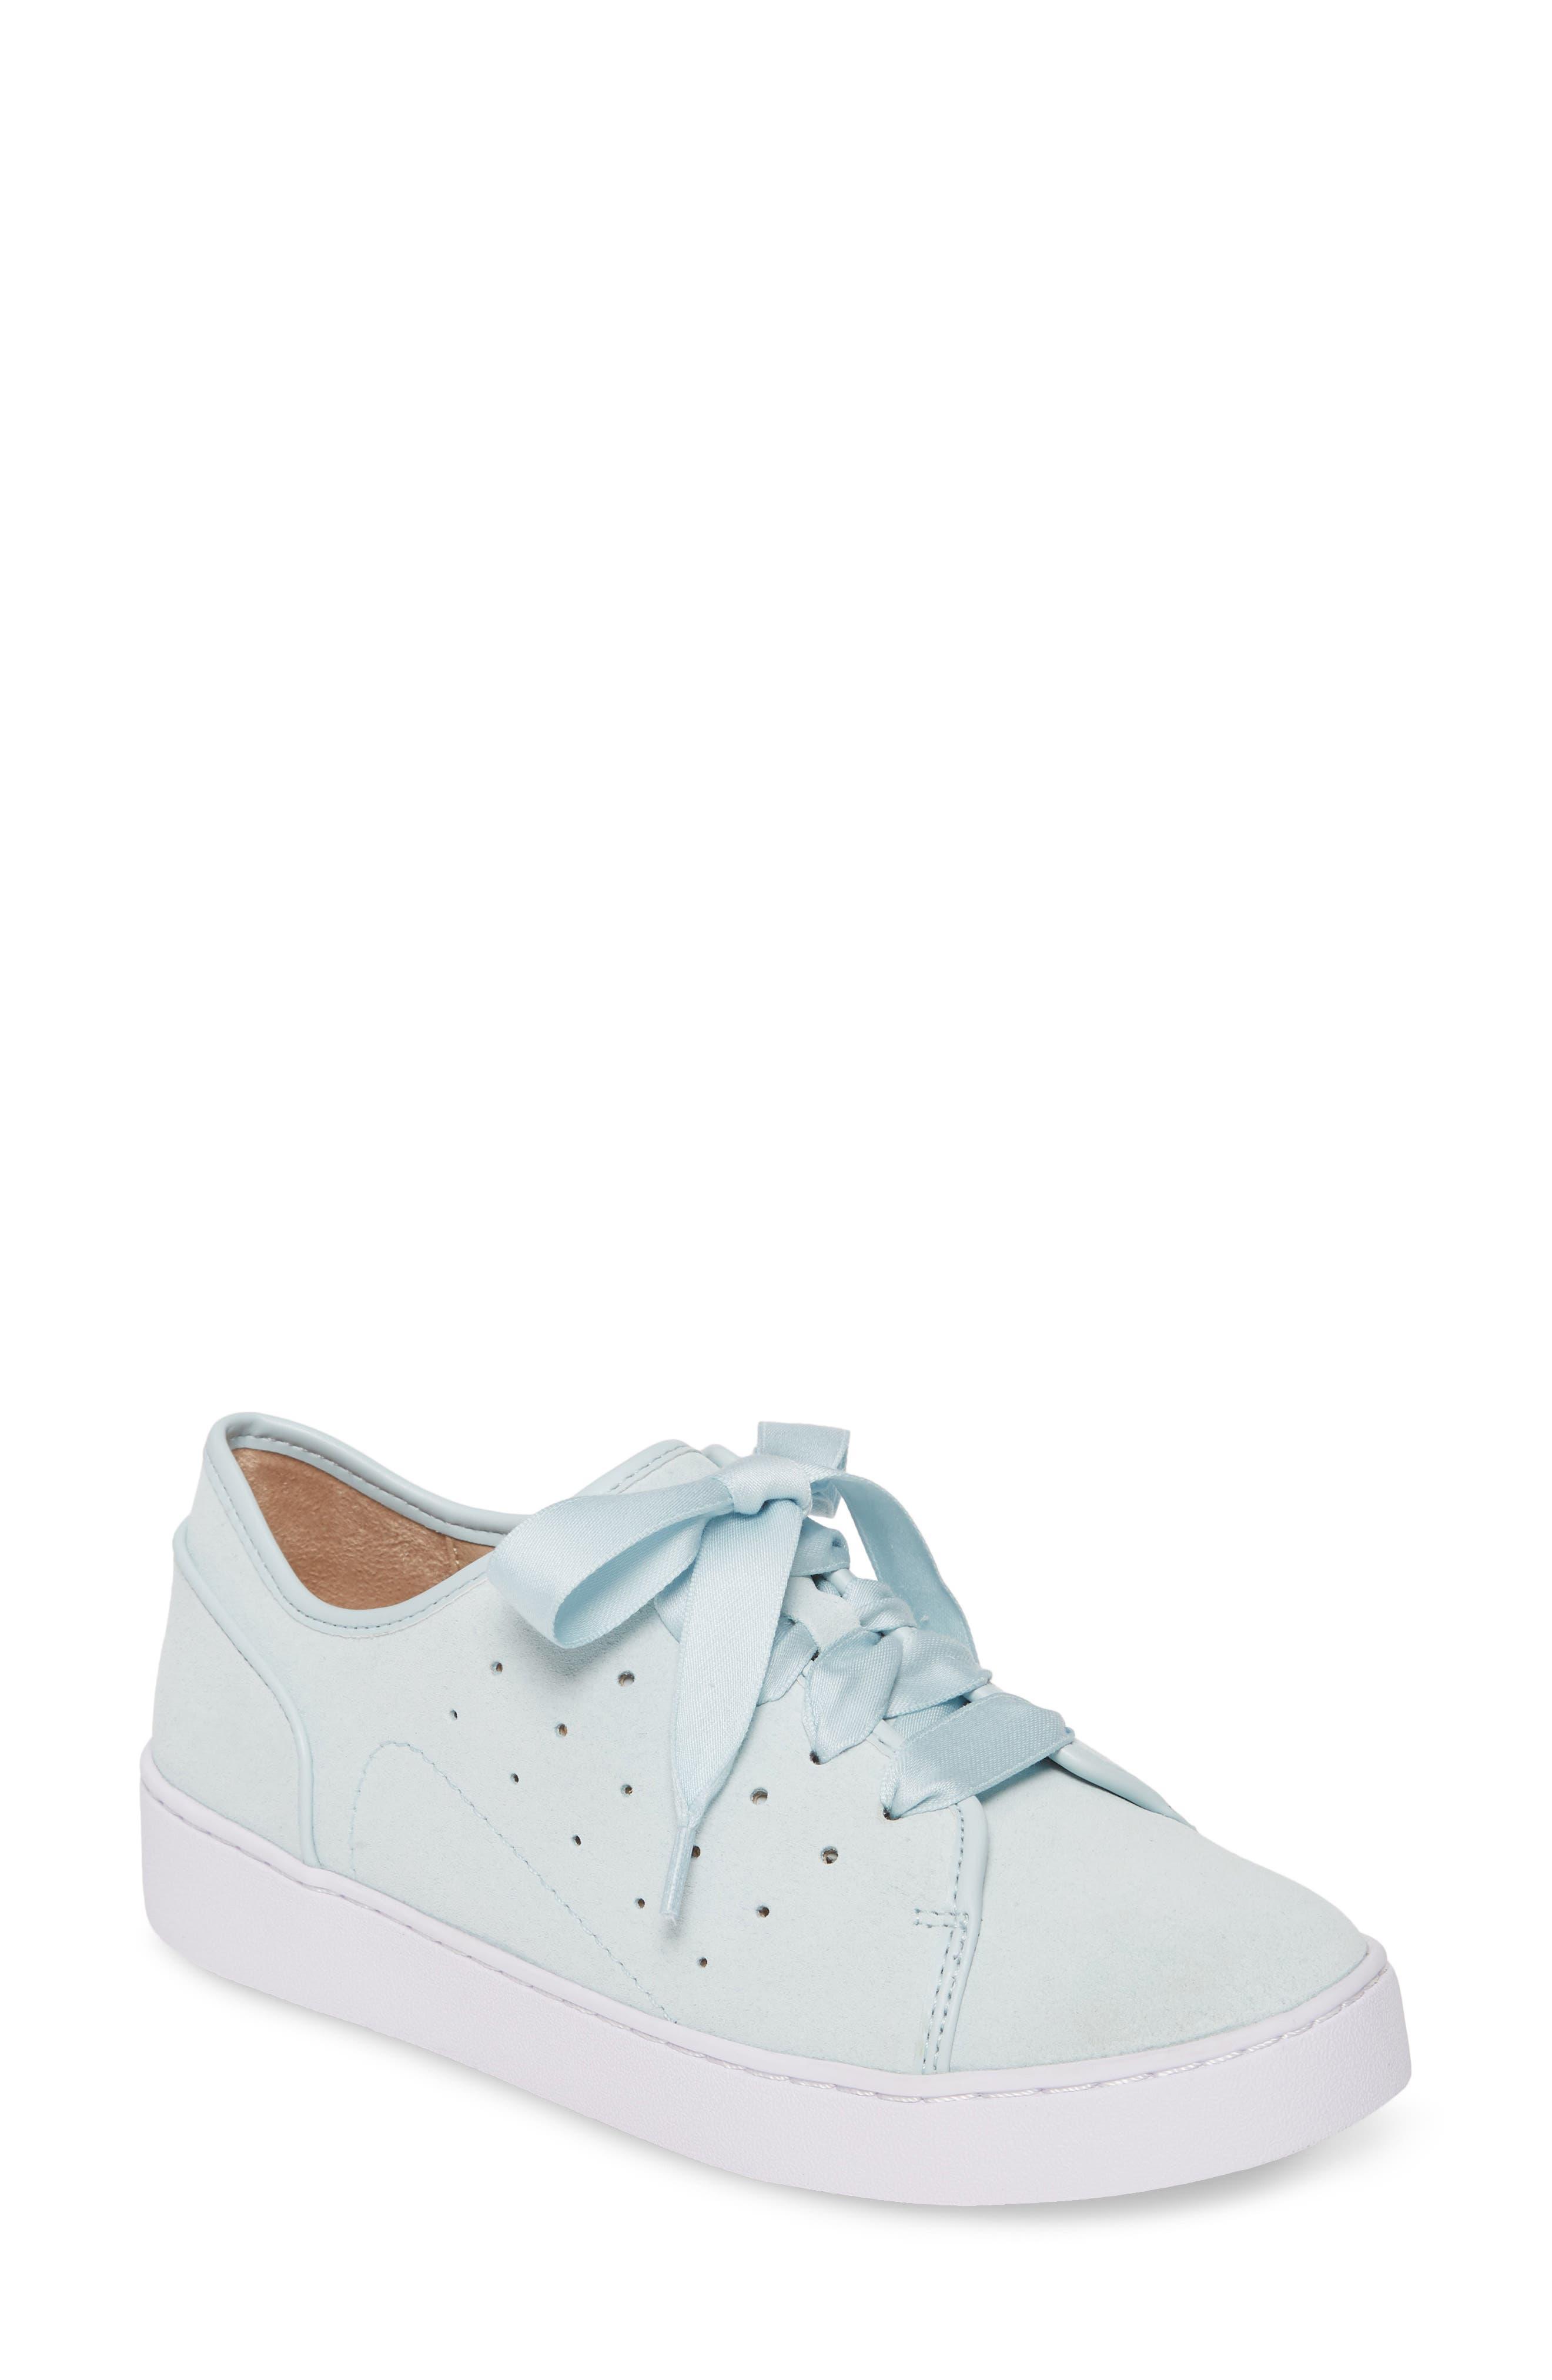 Vionic Keke Sneaker, Blue